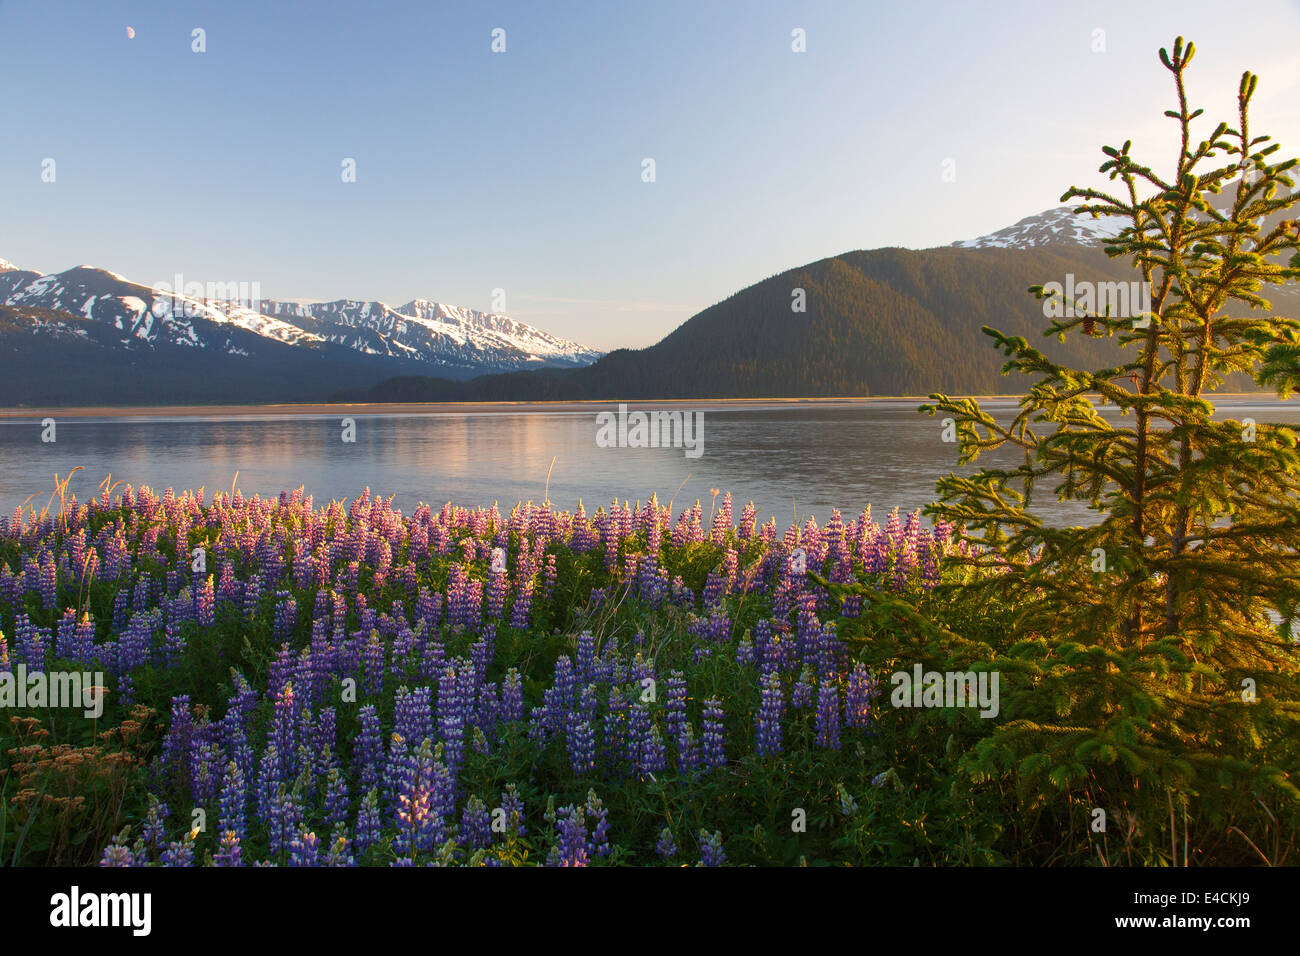 Ein Feld von Lupine entlang Turnagain Arm, Chugach National Forest, Alaska. Stockfoto